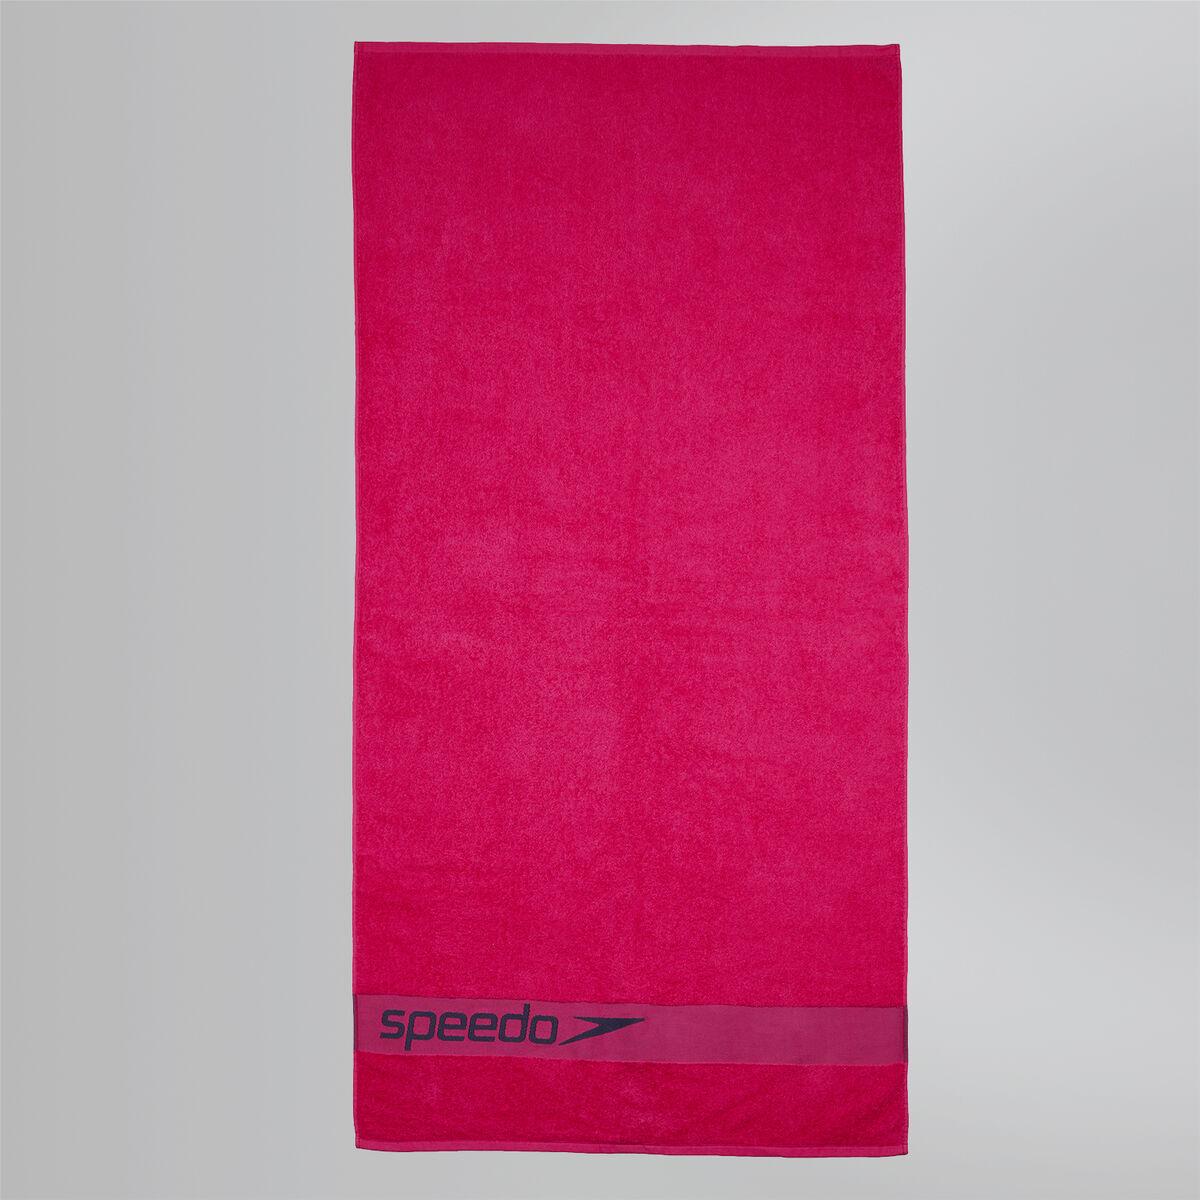 Speedo Border Towel